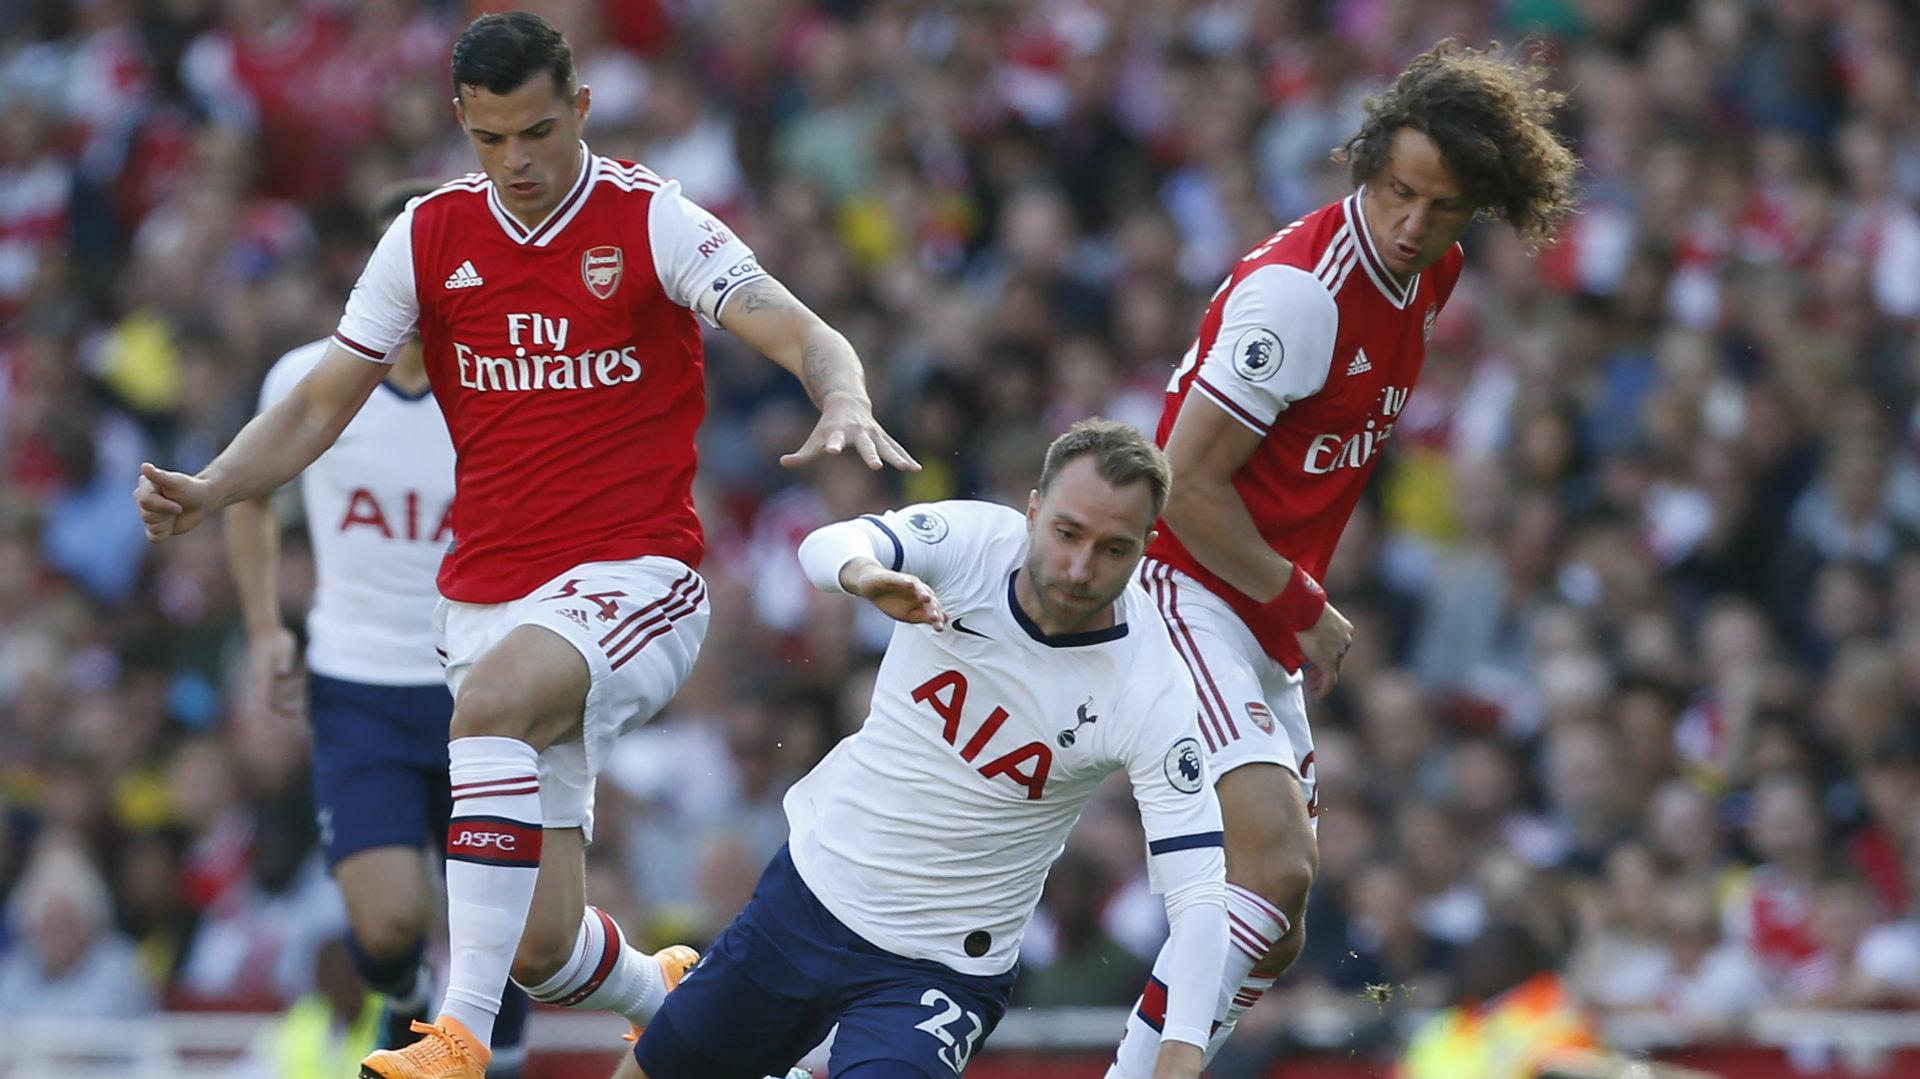 Alan Shearer Sebut Pertahanan Arsenal Seperti Tim Amatir